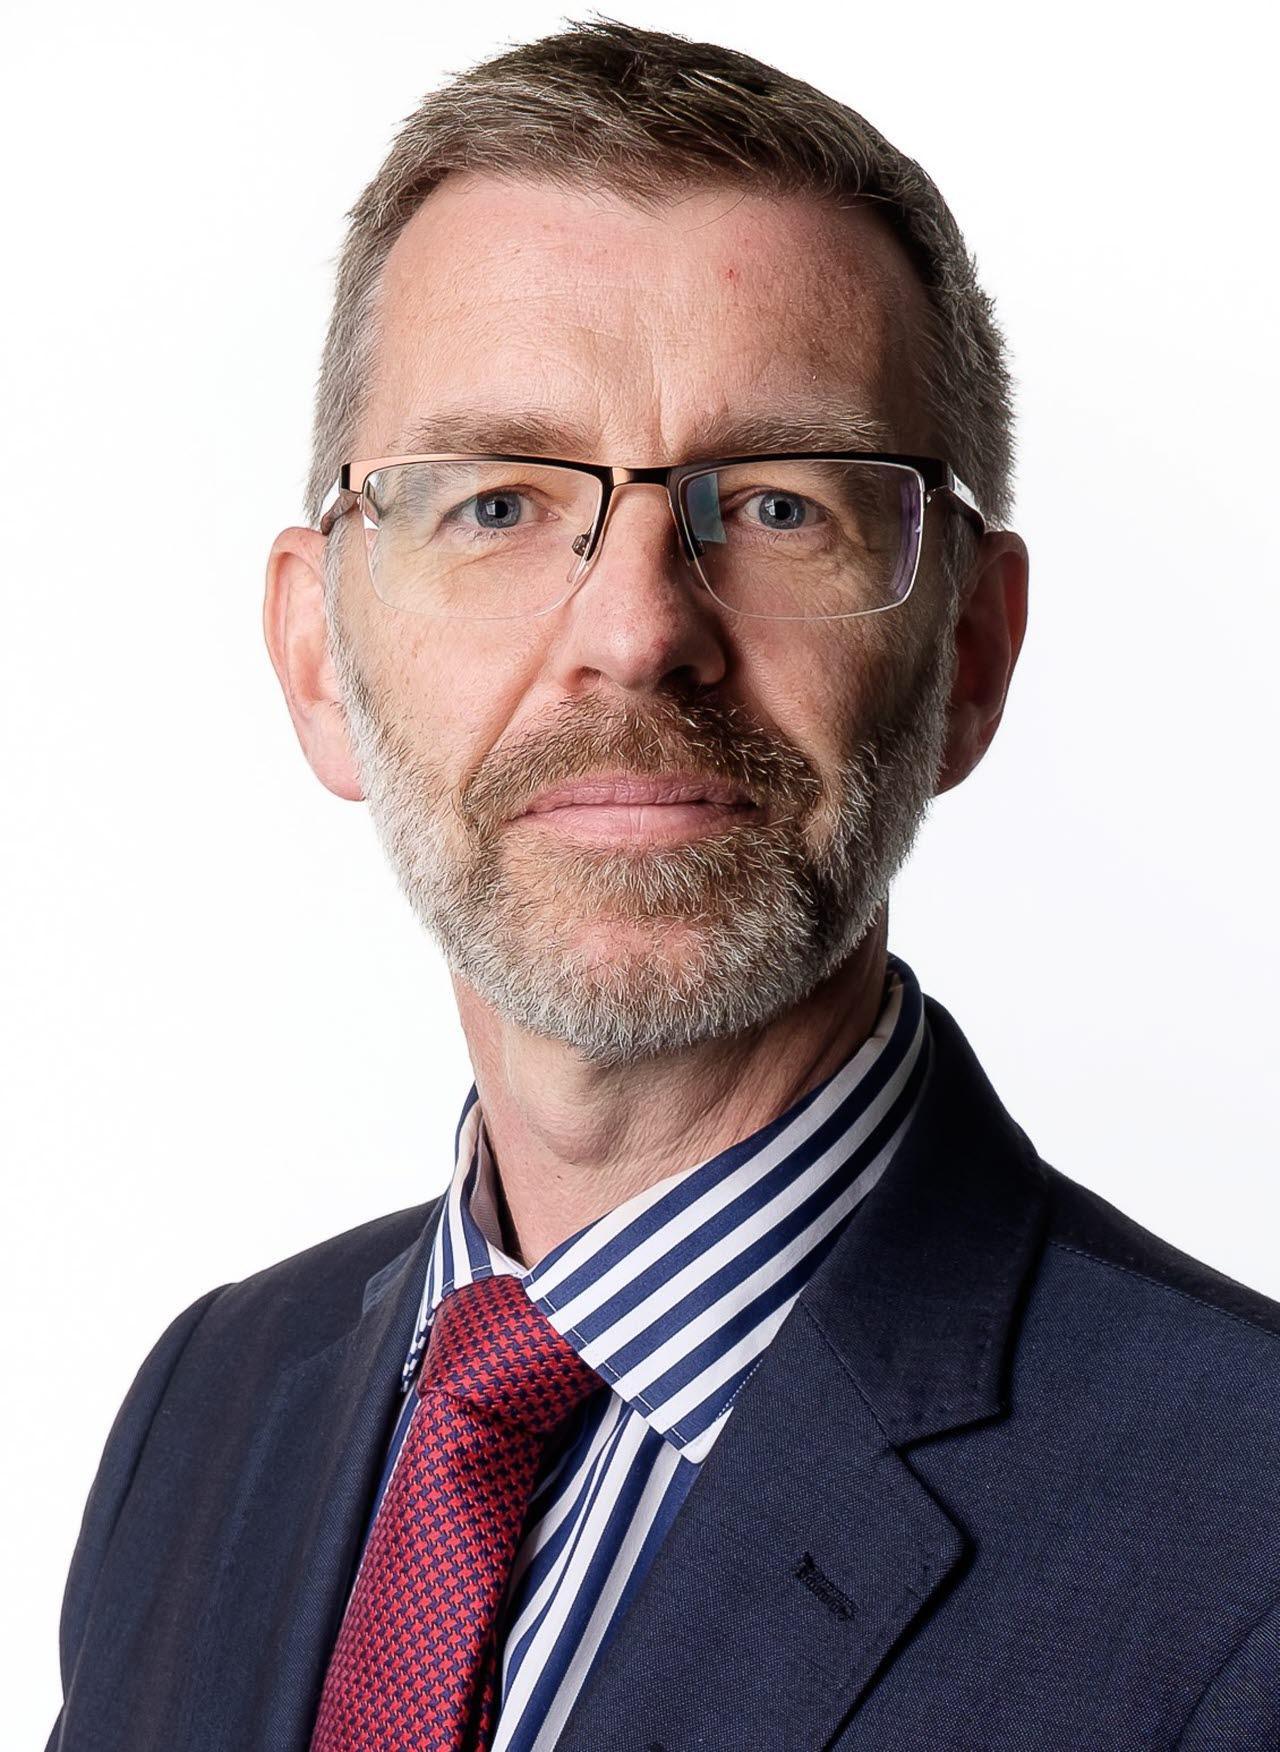 Kevin Brogan